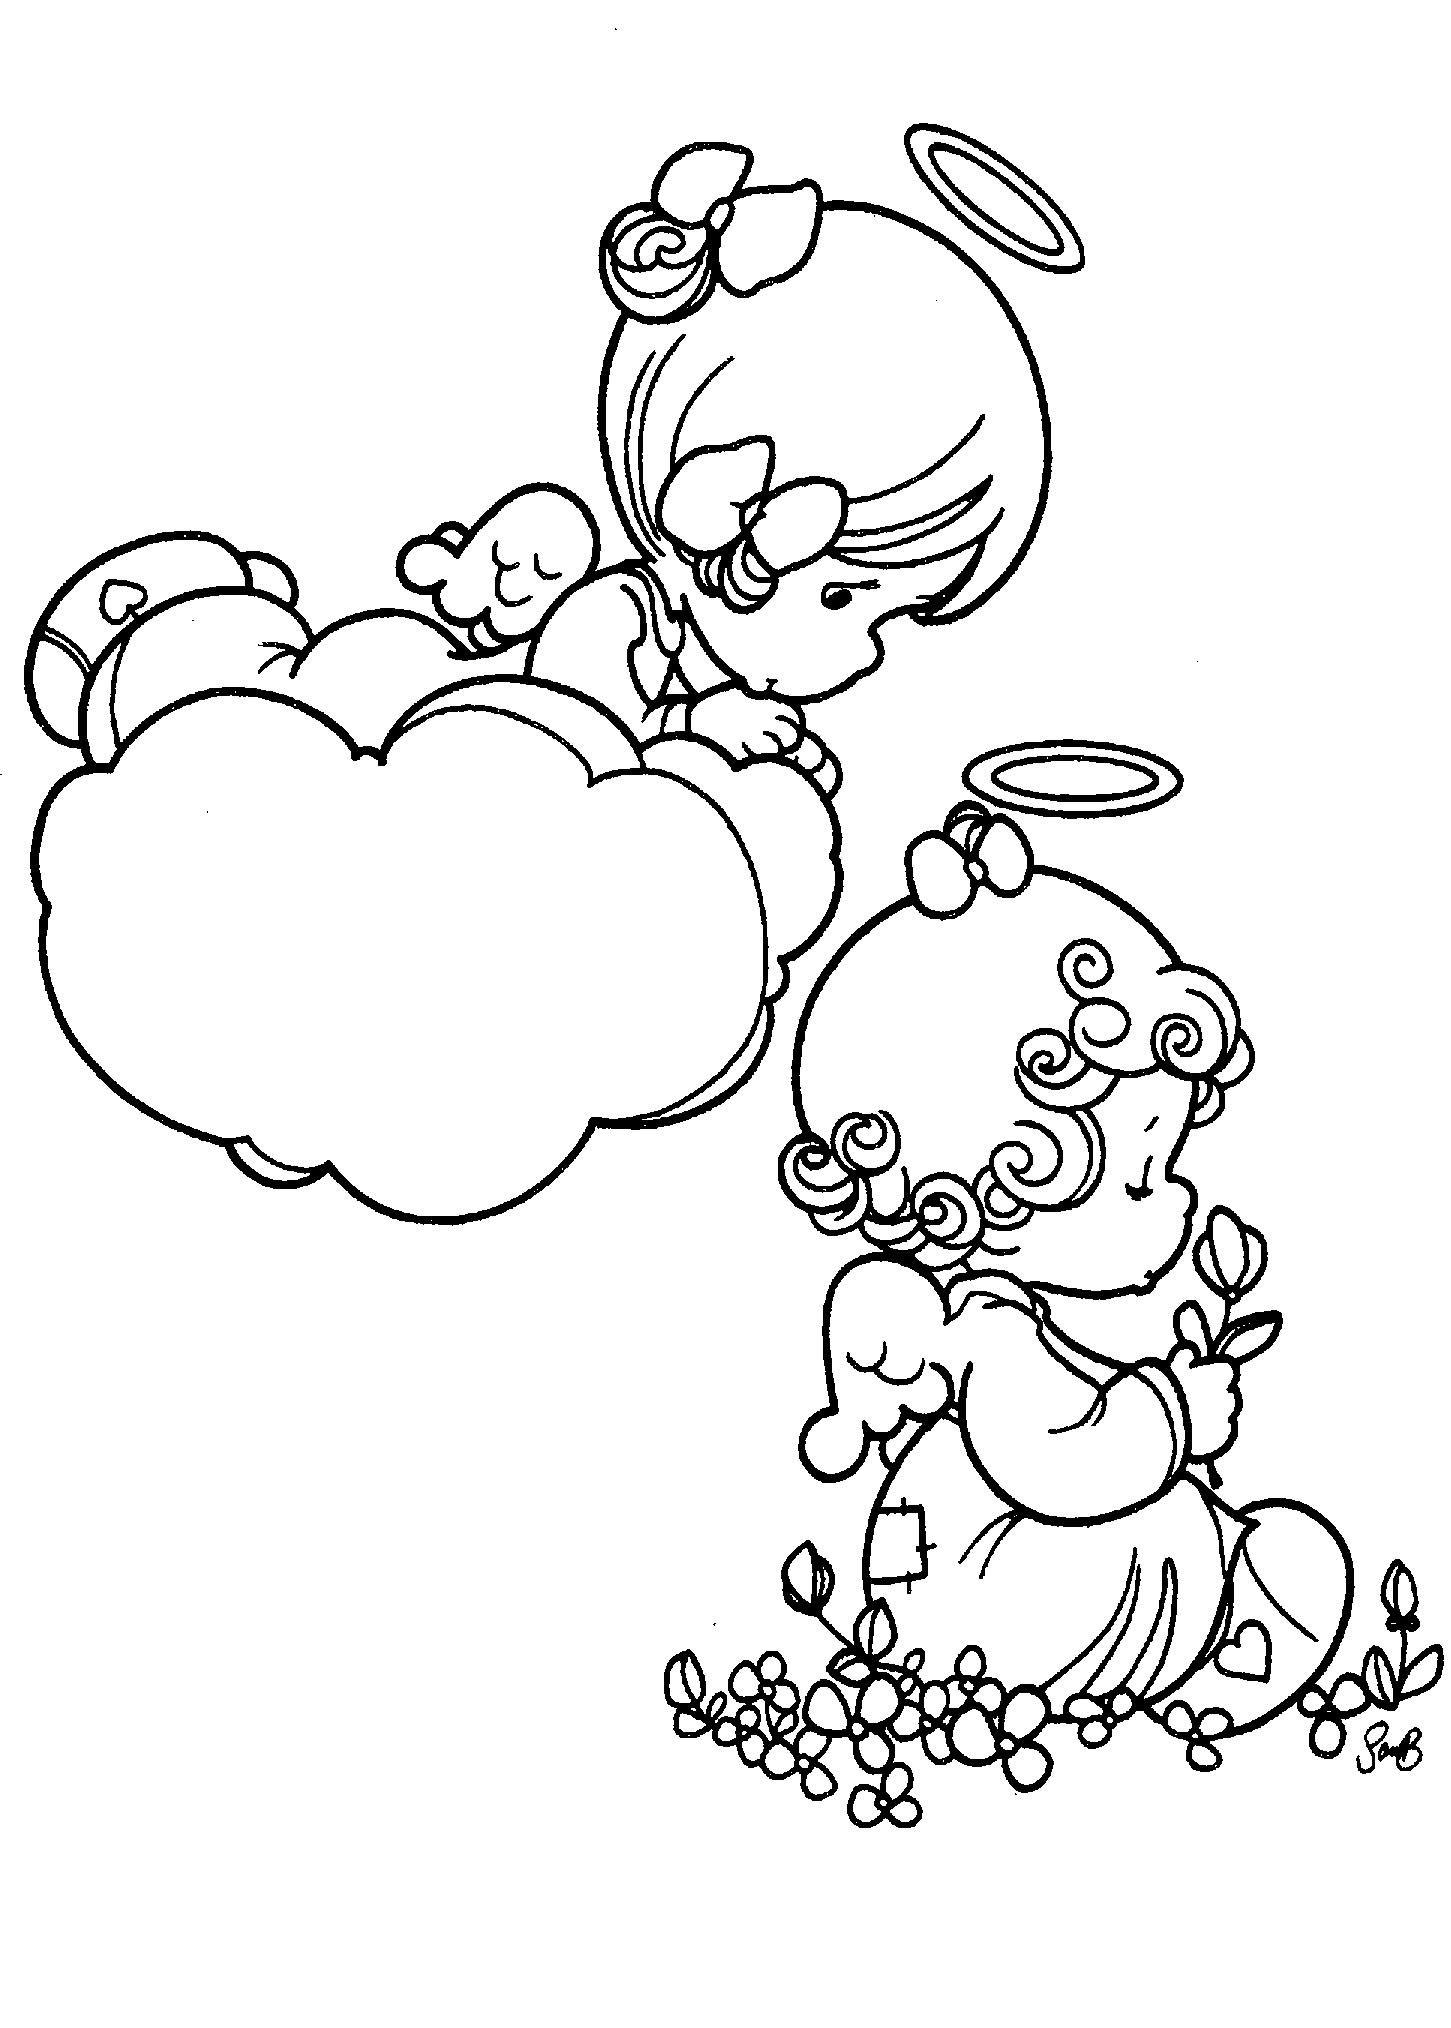 Precious moments love coloring pages colring colorir desenhos